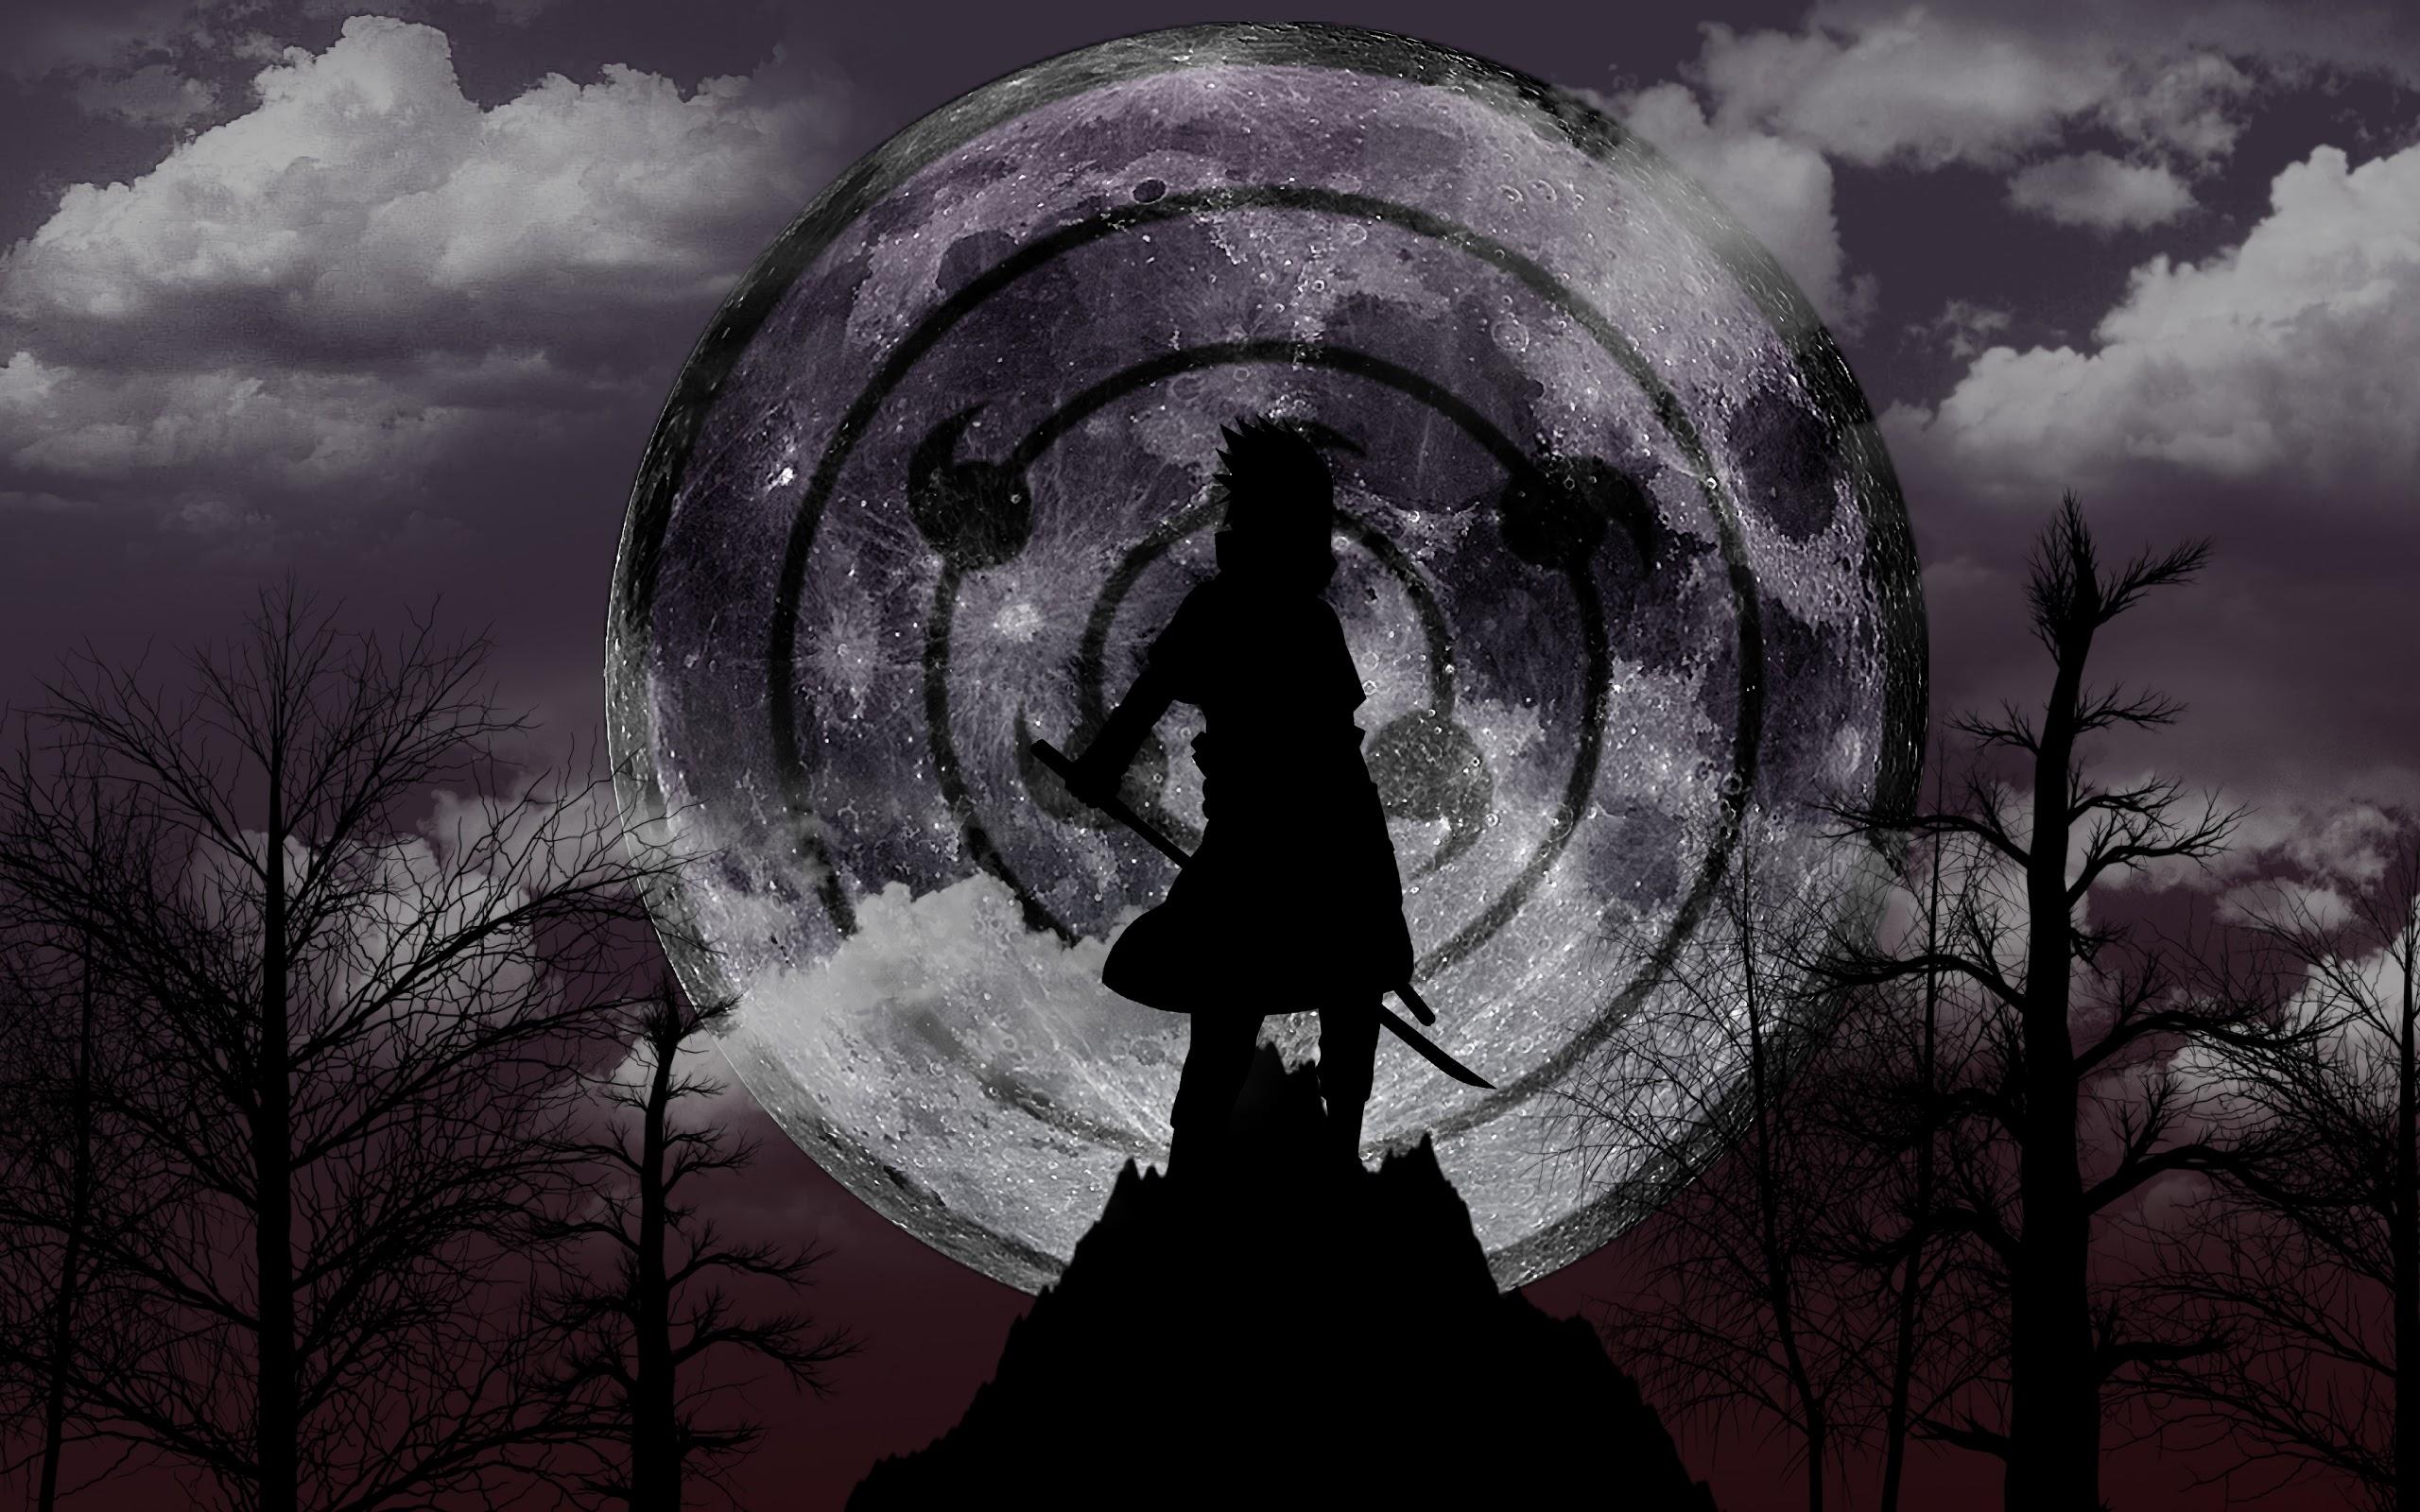 Sasuke Uchiha, Rinnegan, Sharingan, 4k, - Xxxtentacion Jocelyn Flores Downtime Remix - HD Wallpaper